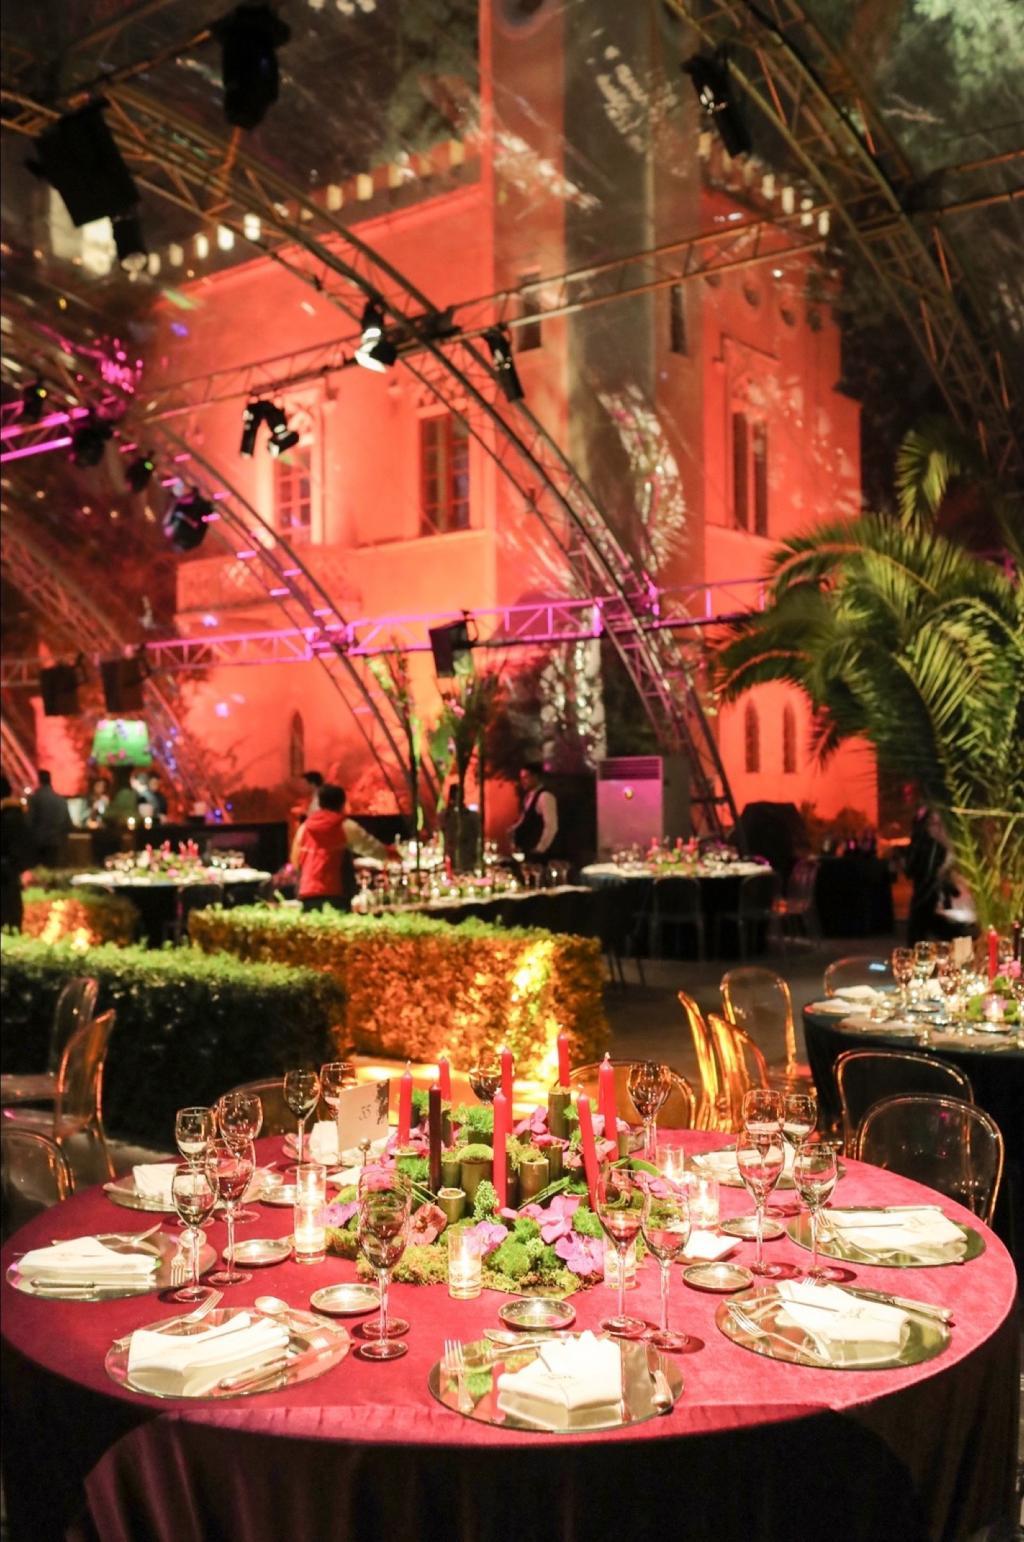 D&G Athens wedding - Image 17